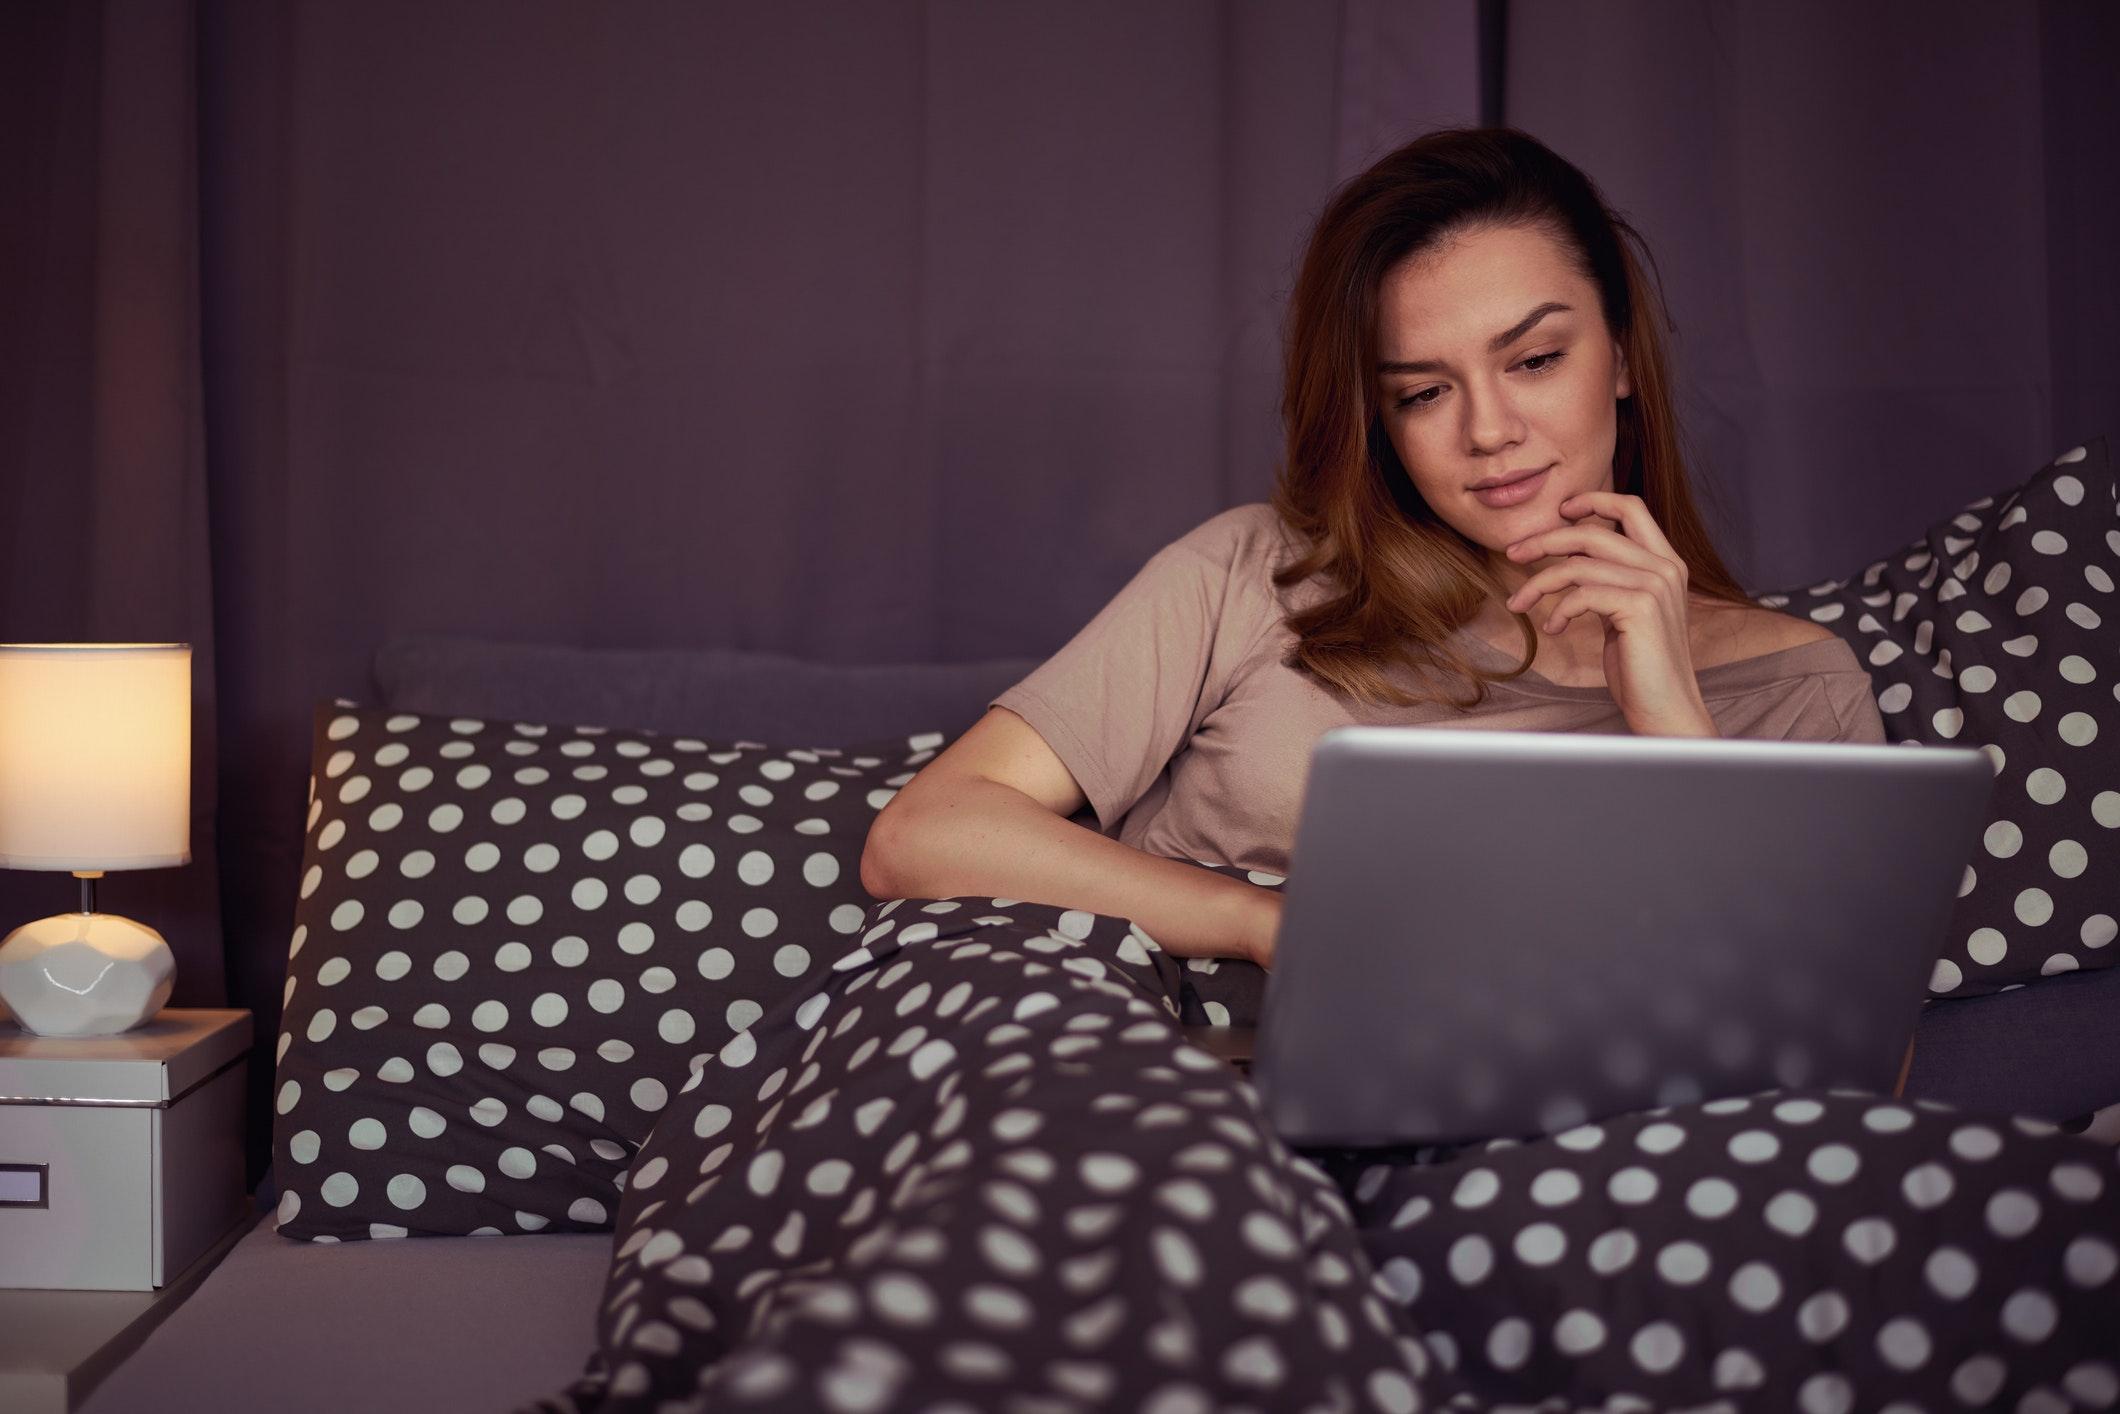 alm sex gode porno hjemmesider